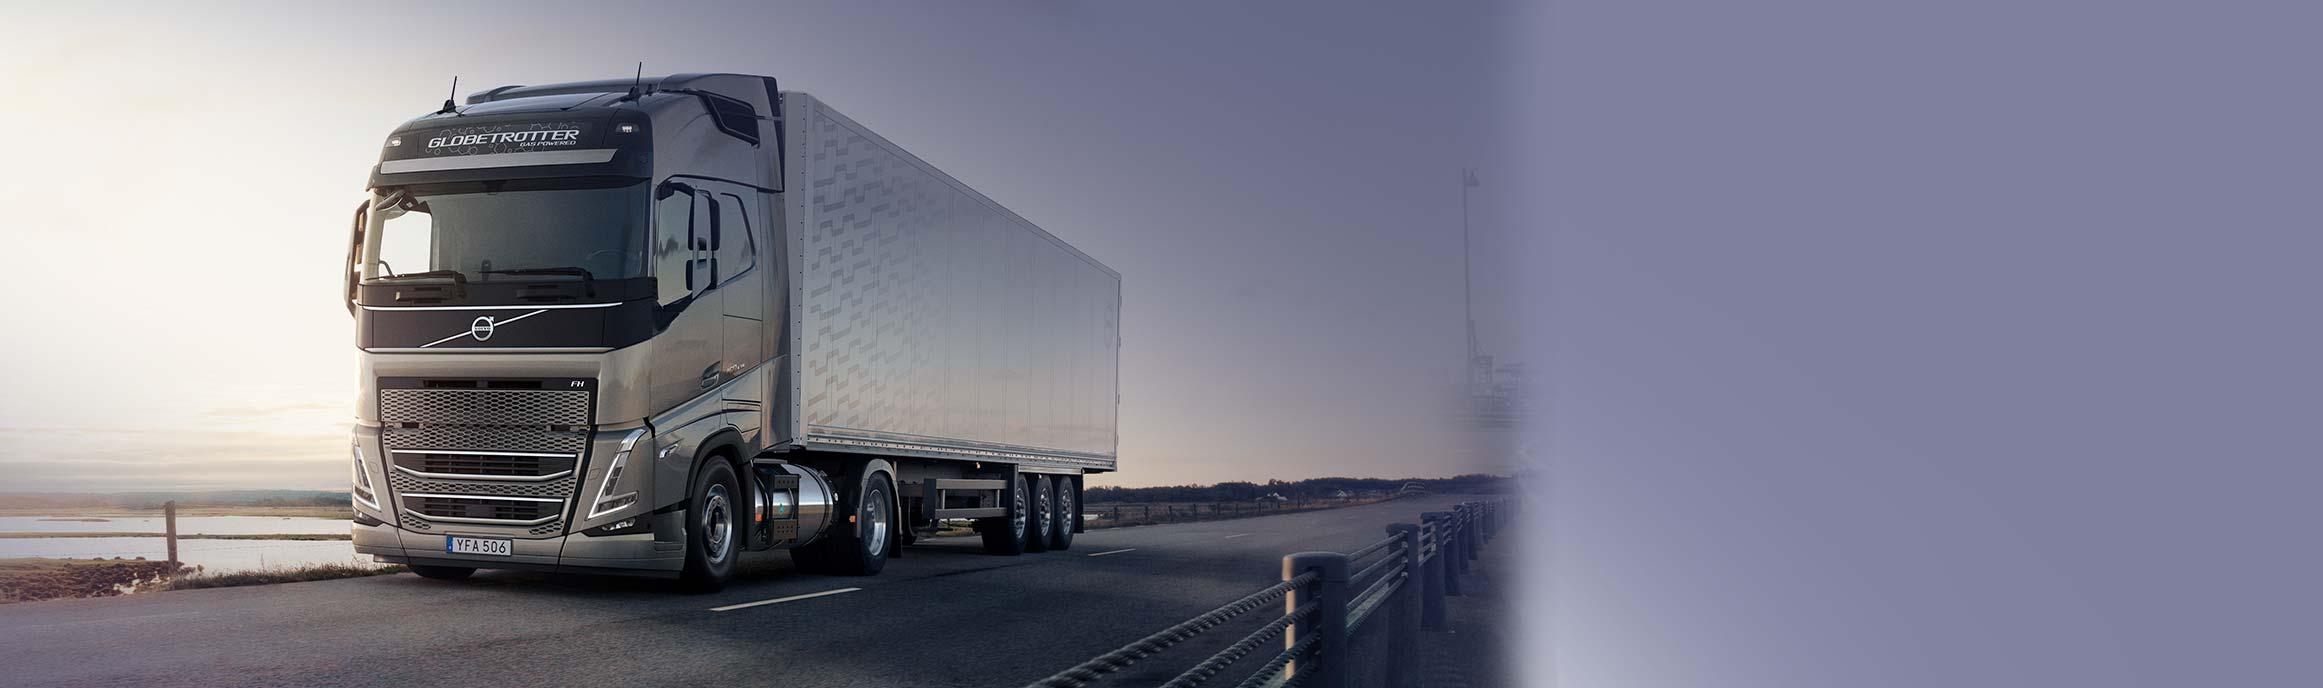 Volvo LNG Trucks bij BAS Truck Center